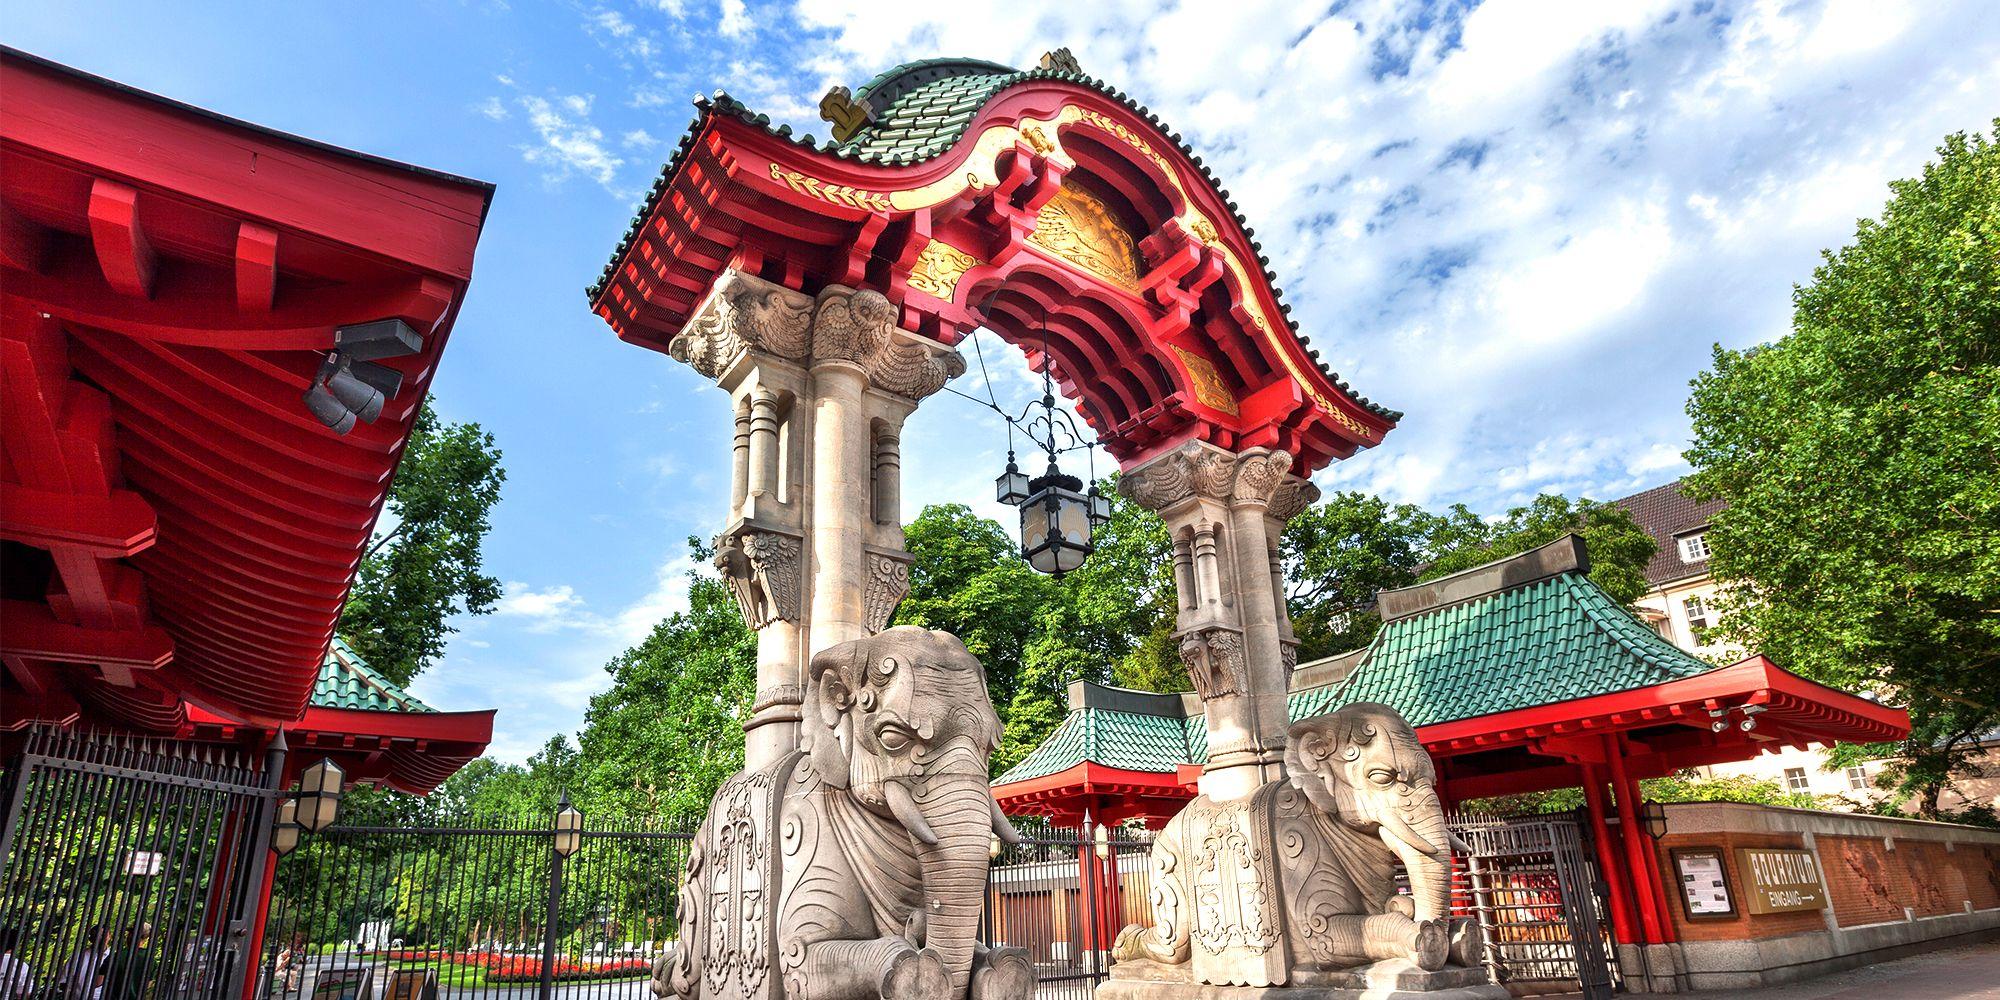 Areas of Tolgalen 1494893181-best-zoos-redo